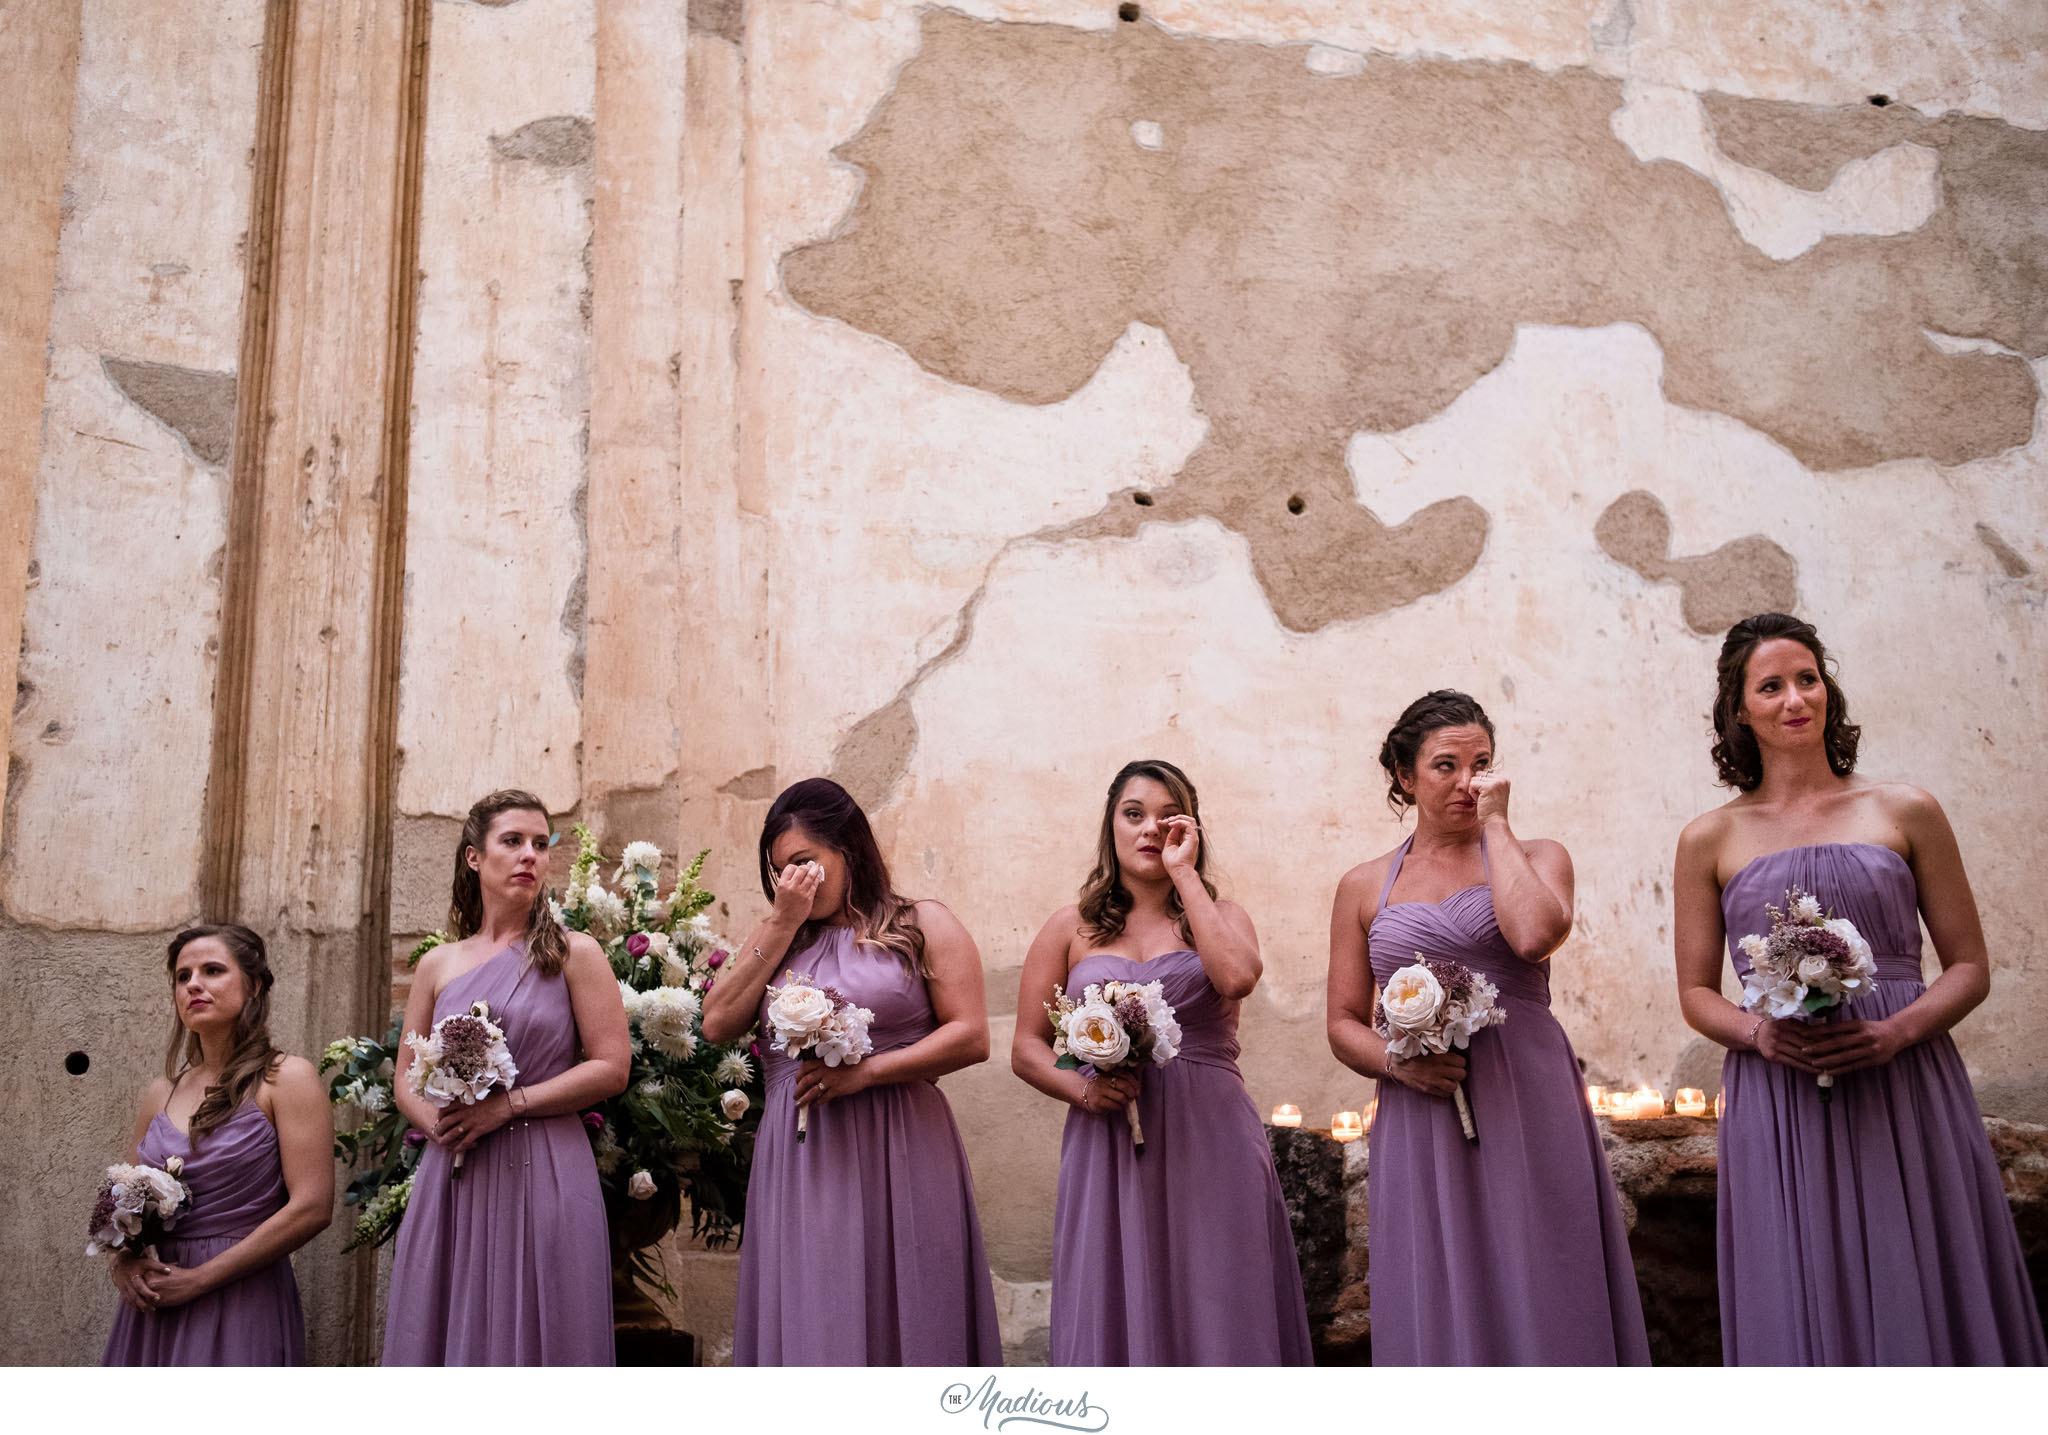 Leigh_Rob_Antigua_Guatemala_Santa_Clara_Destination_Wedding_49.JPG